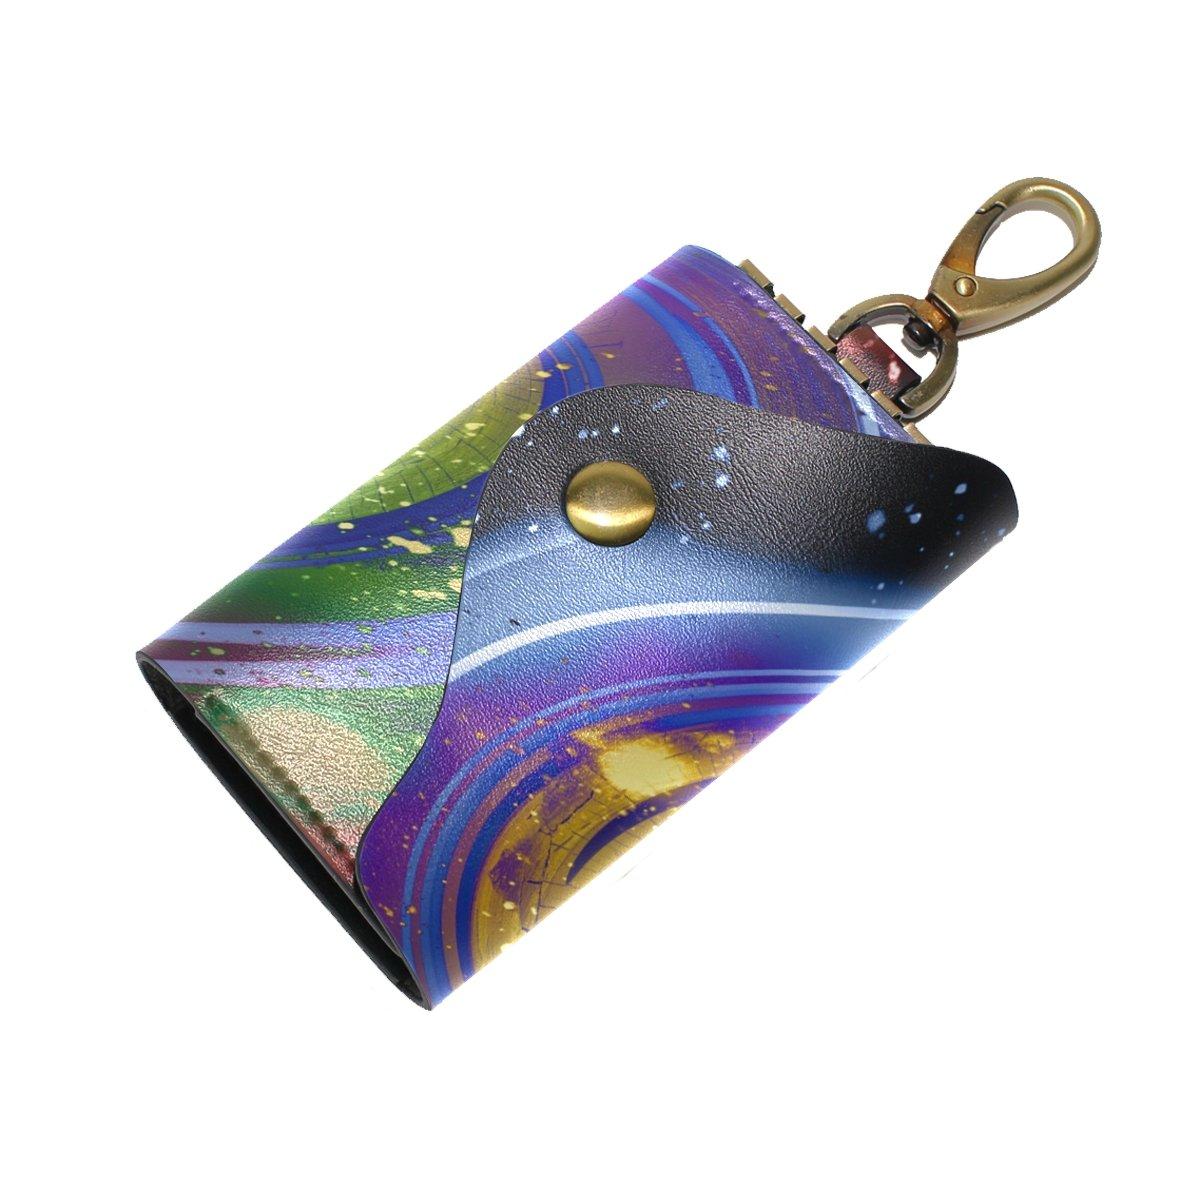 KEAKIA Universe Yin Yang Leather Key Case Wallets Tri-fold Key Holder Keychains with 6 Hooks 2 Slot Snap Closure for Men Women